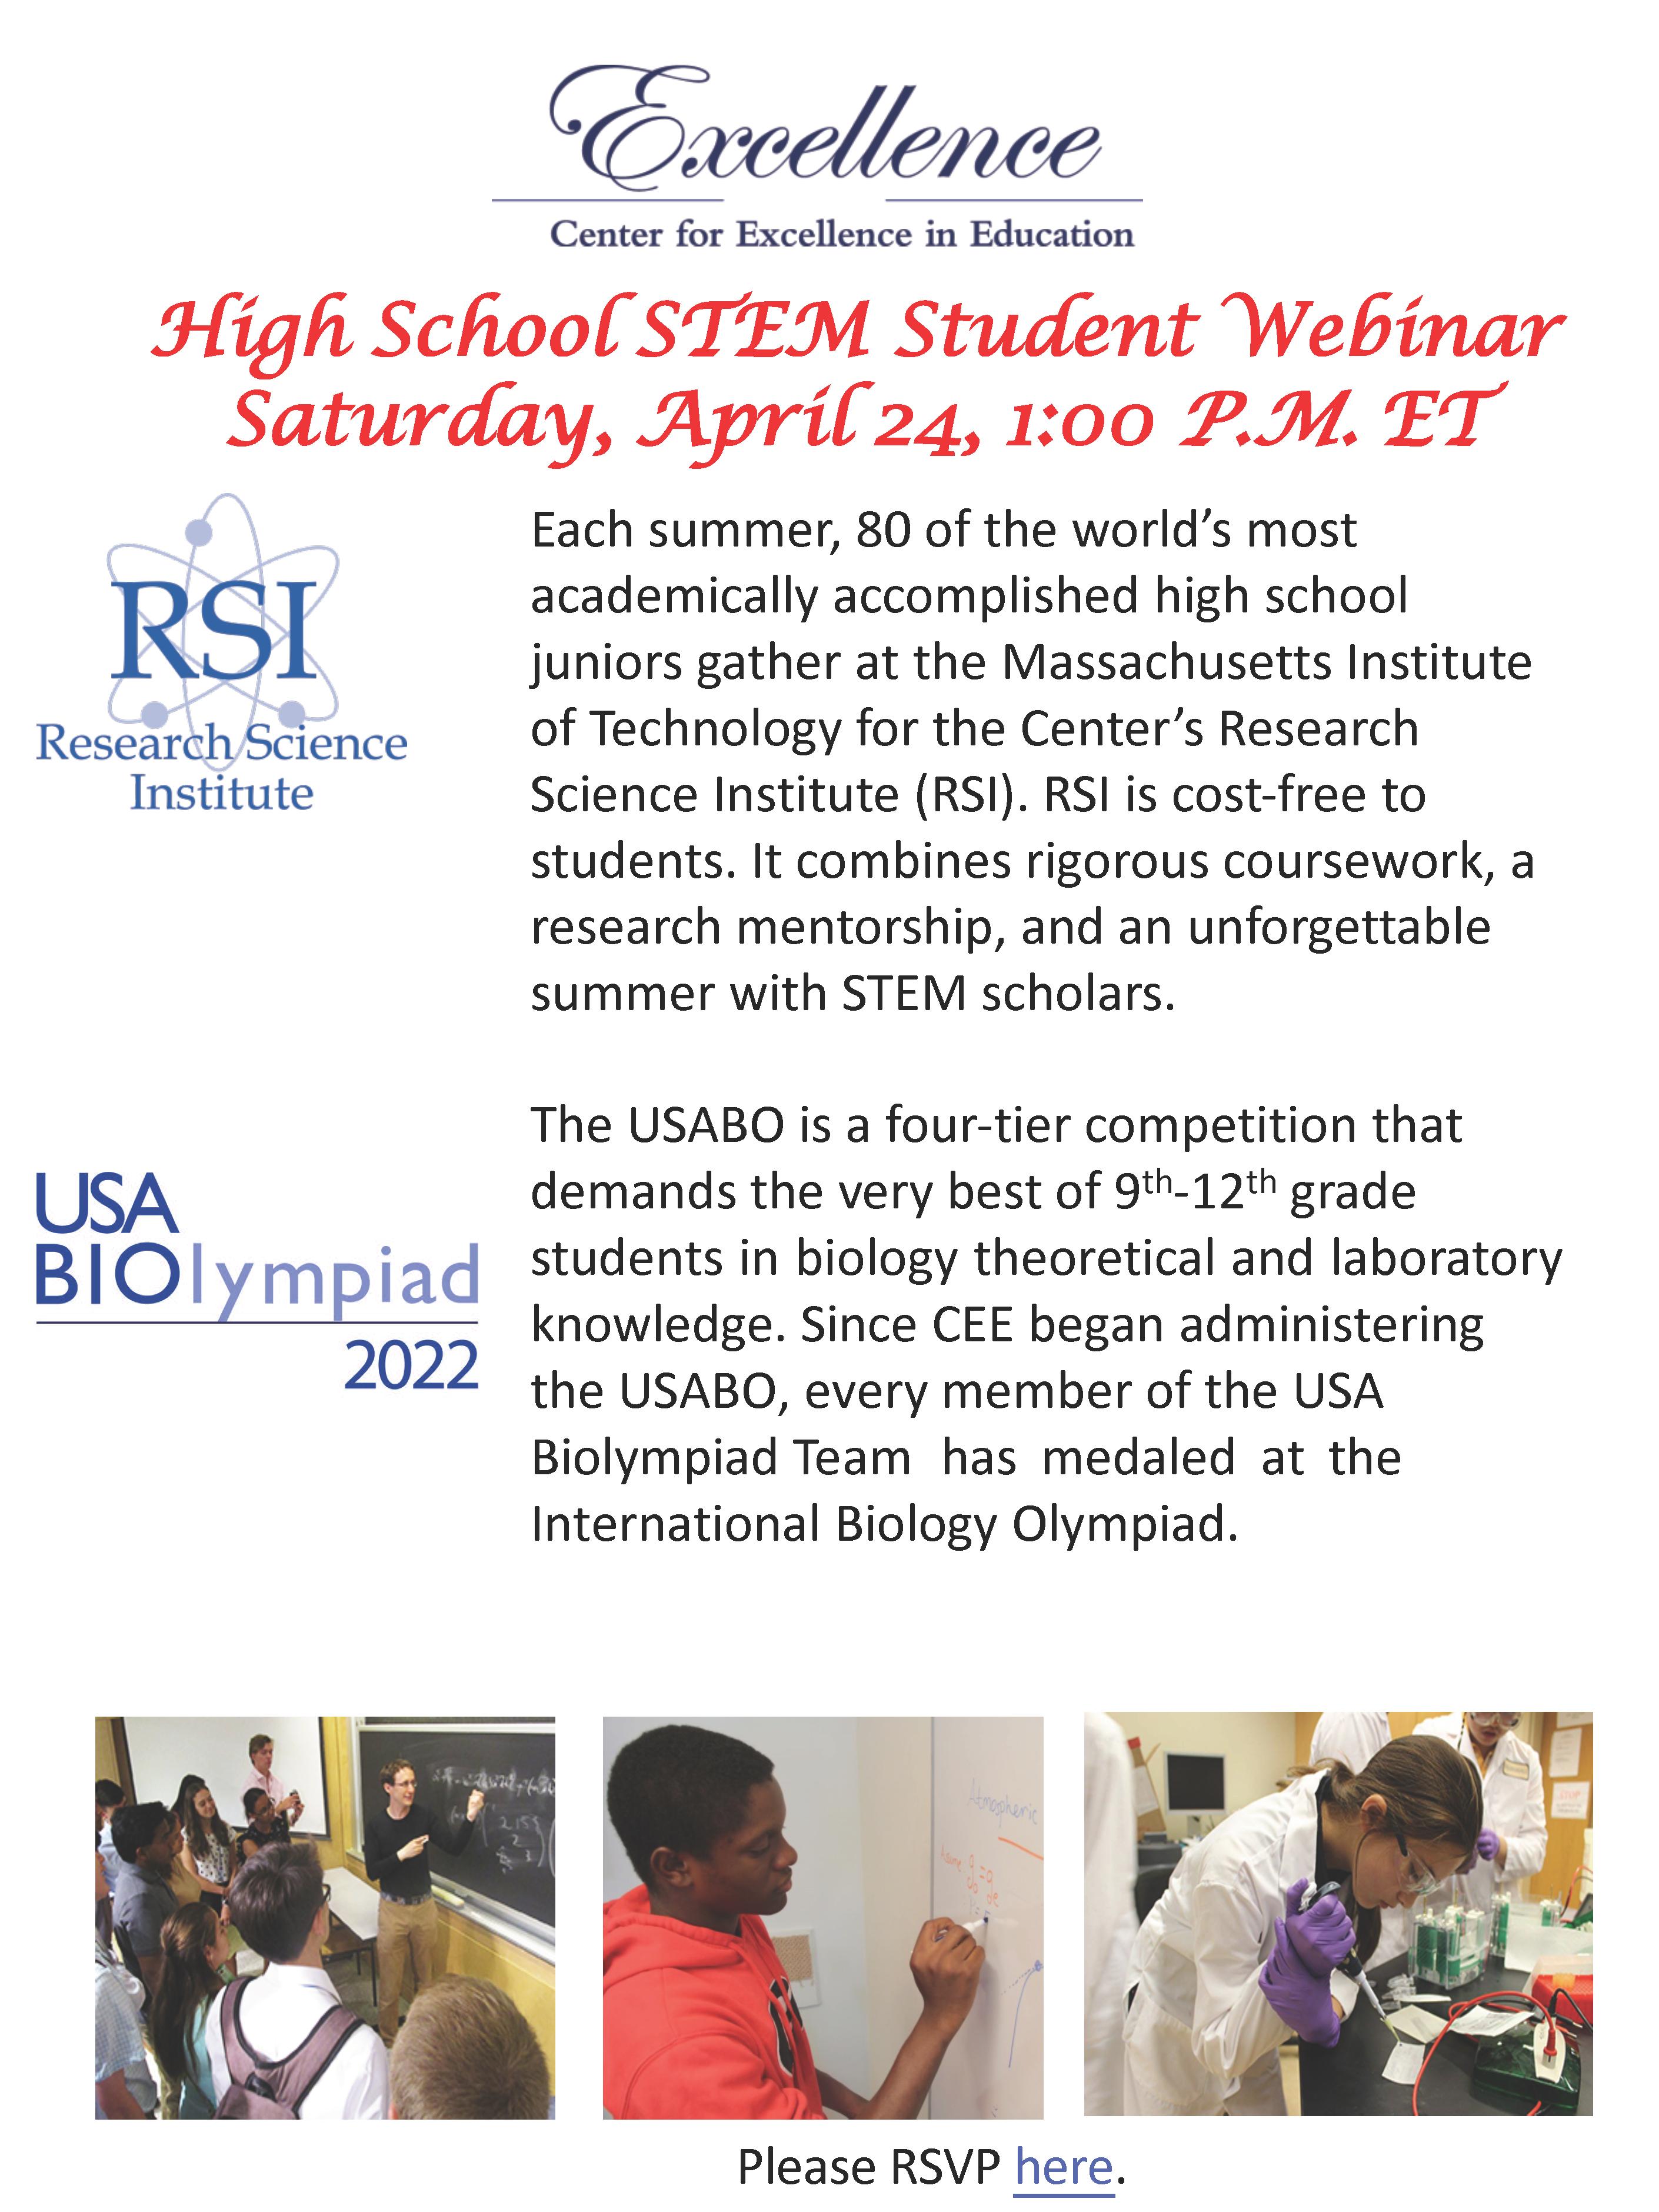 High School STEM Student Webinar